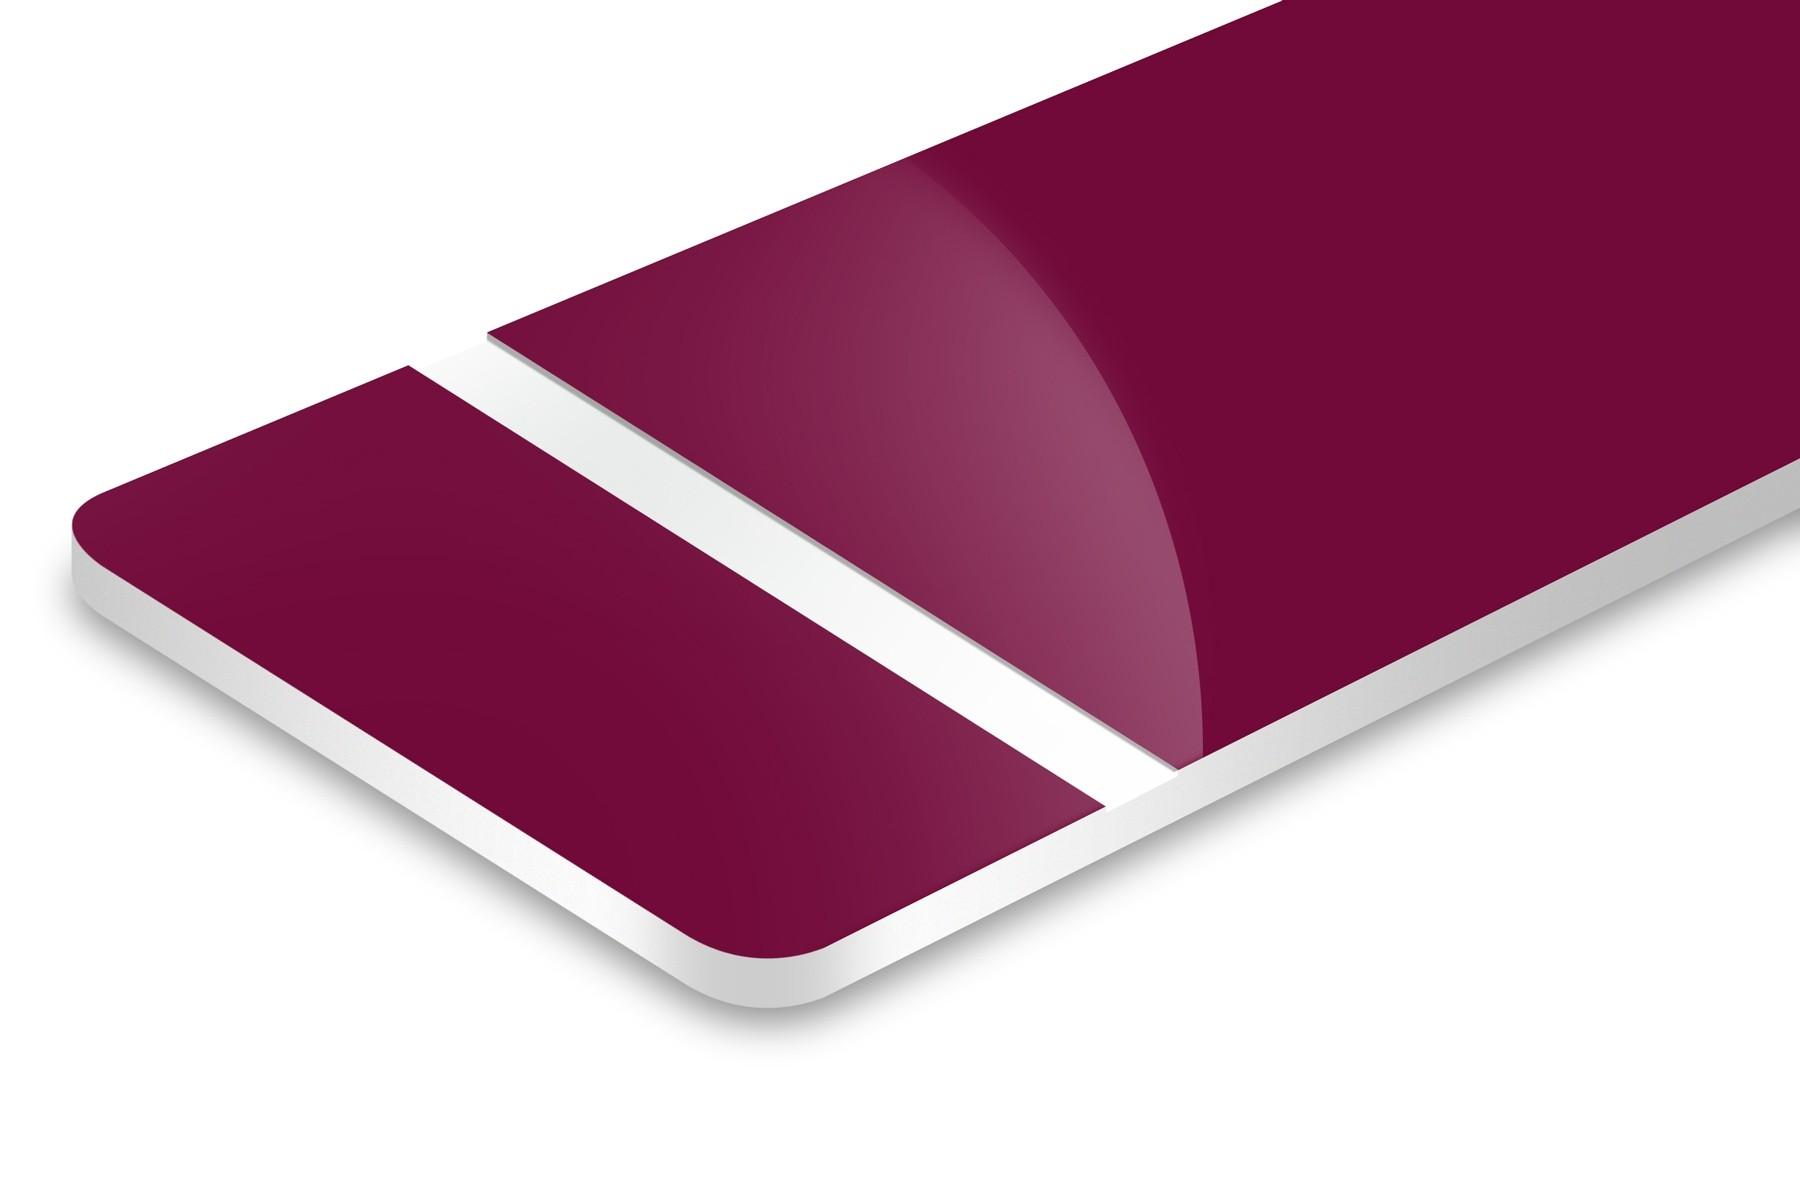 PH632-206 Ruby/White 1,6mm